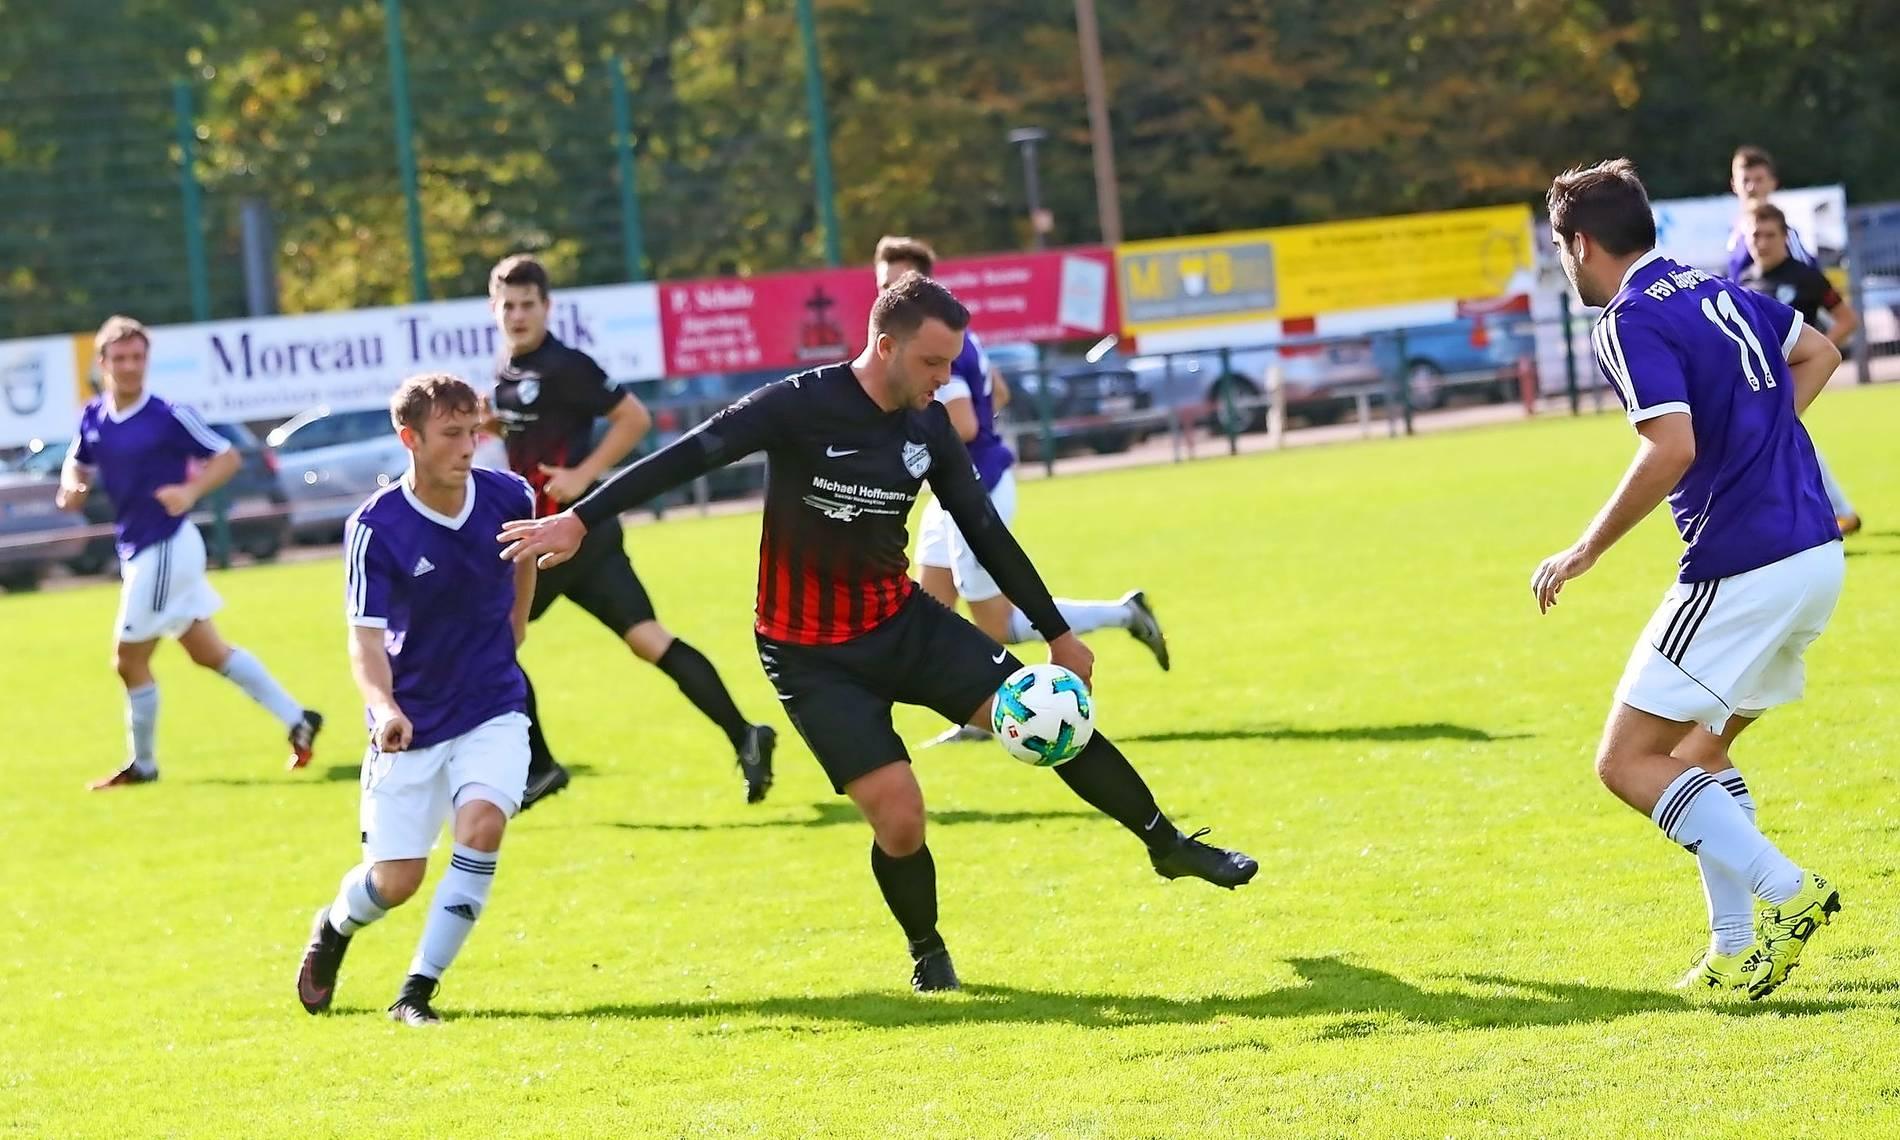 Verbandsliga Nord